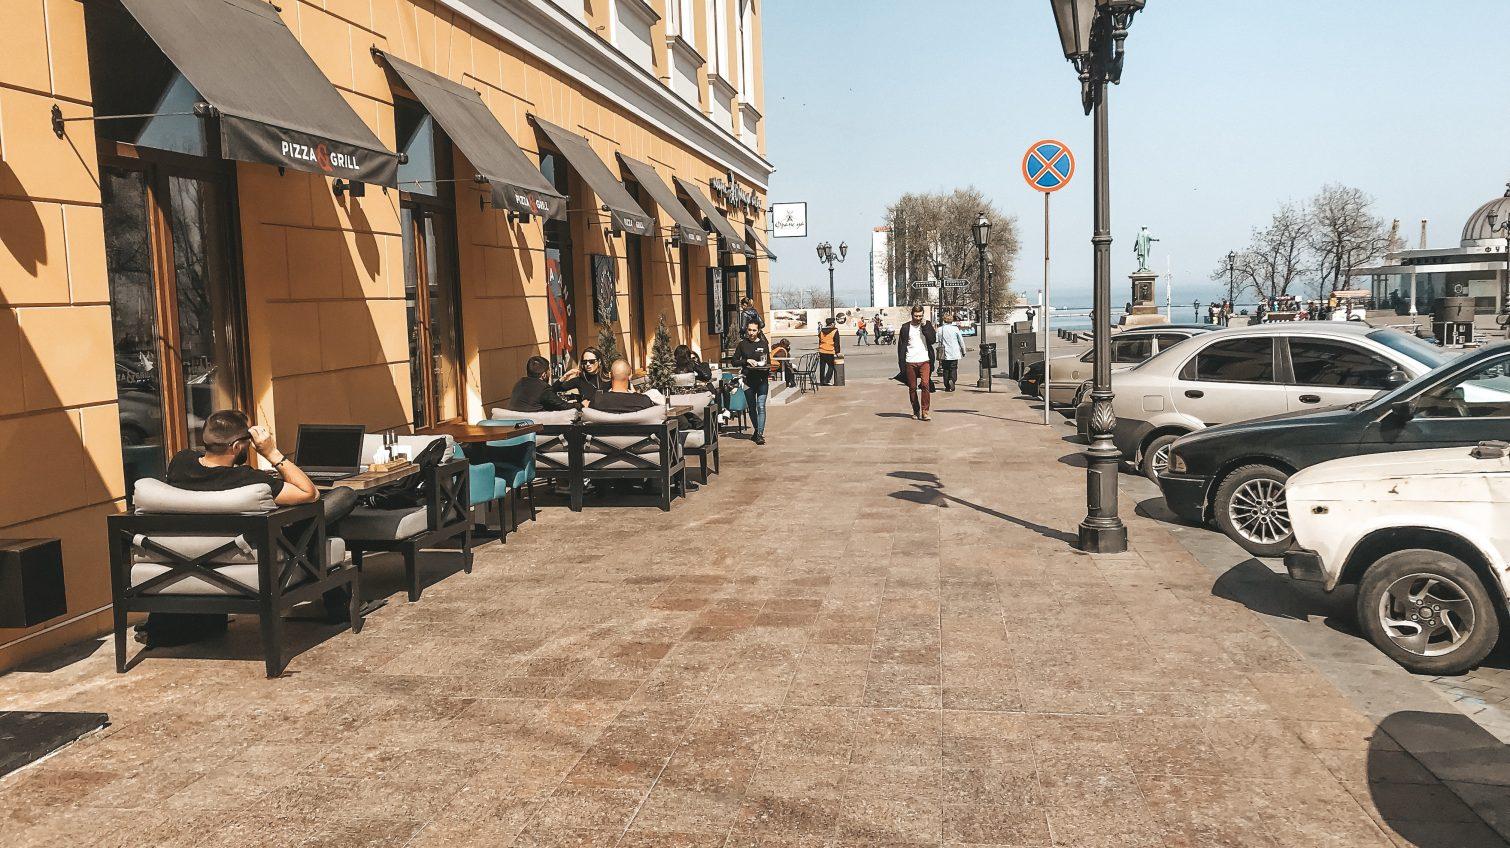 Начало сезона: одесские кафе устанавливают летние площадки (фоторепортаж) «фото»